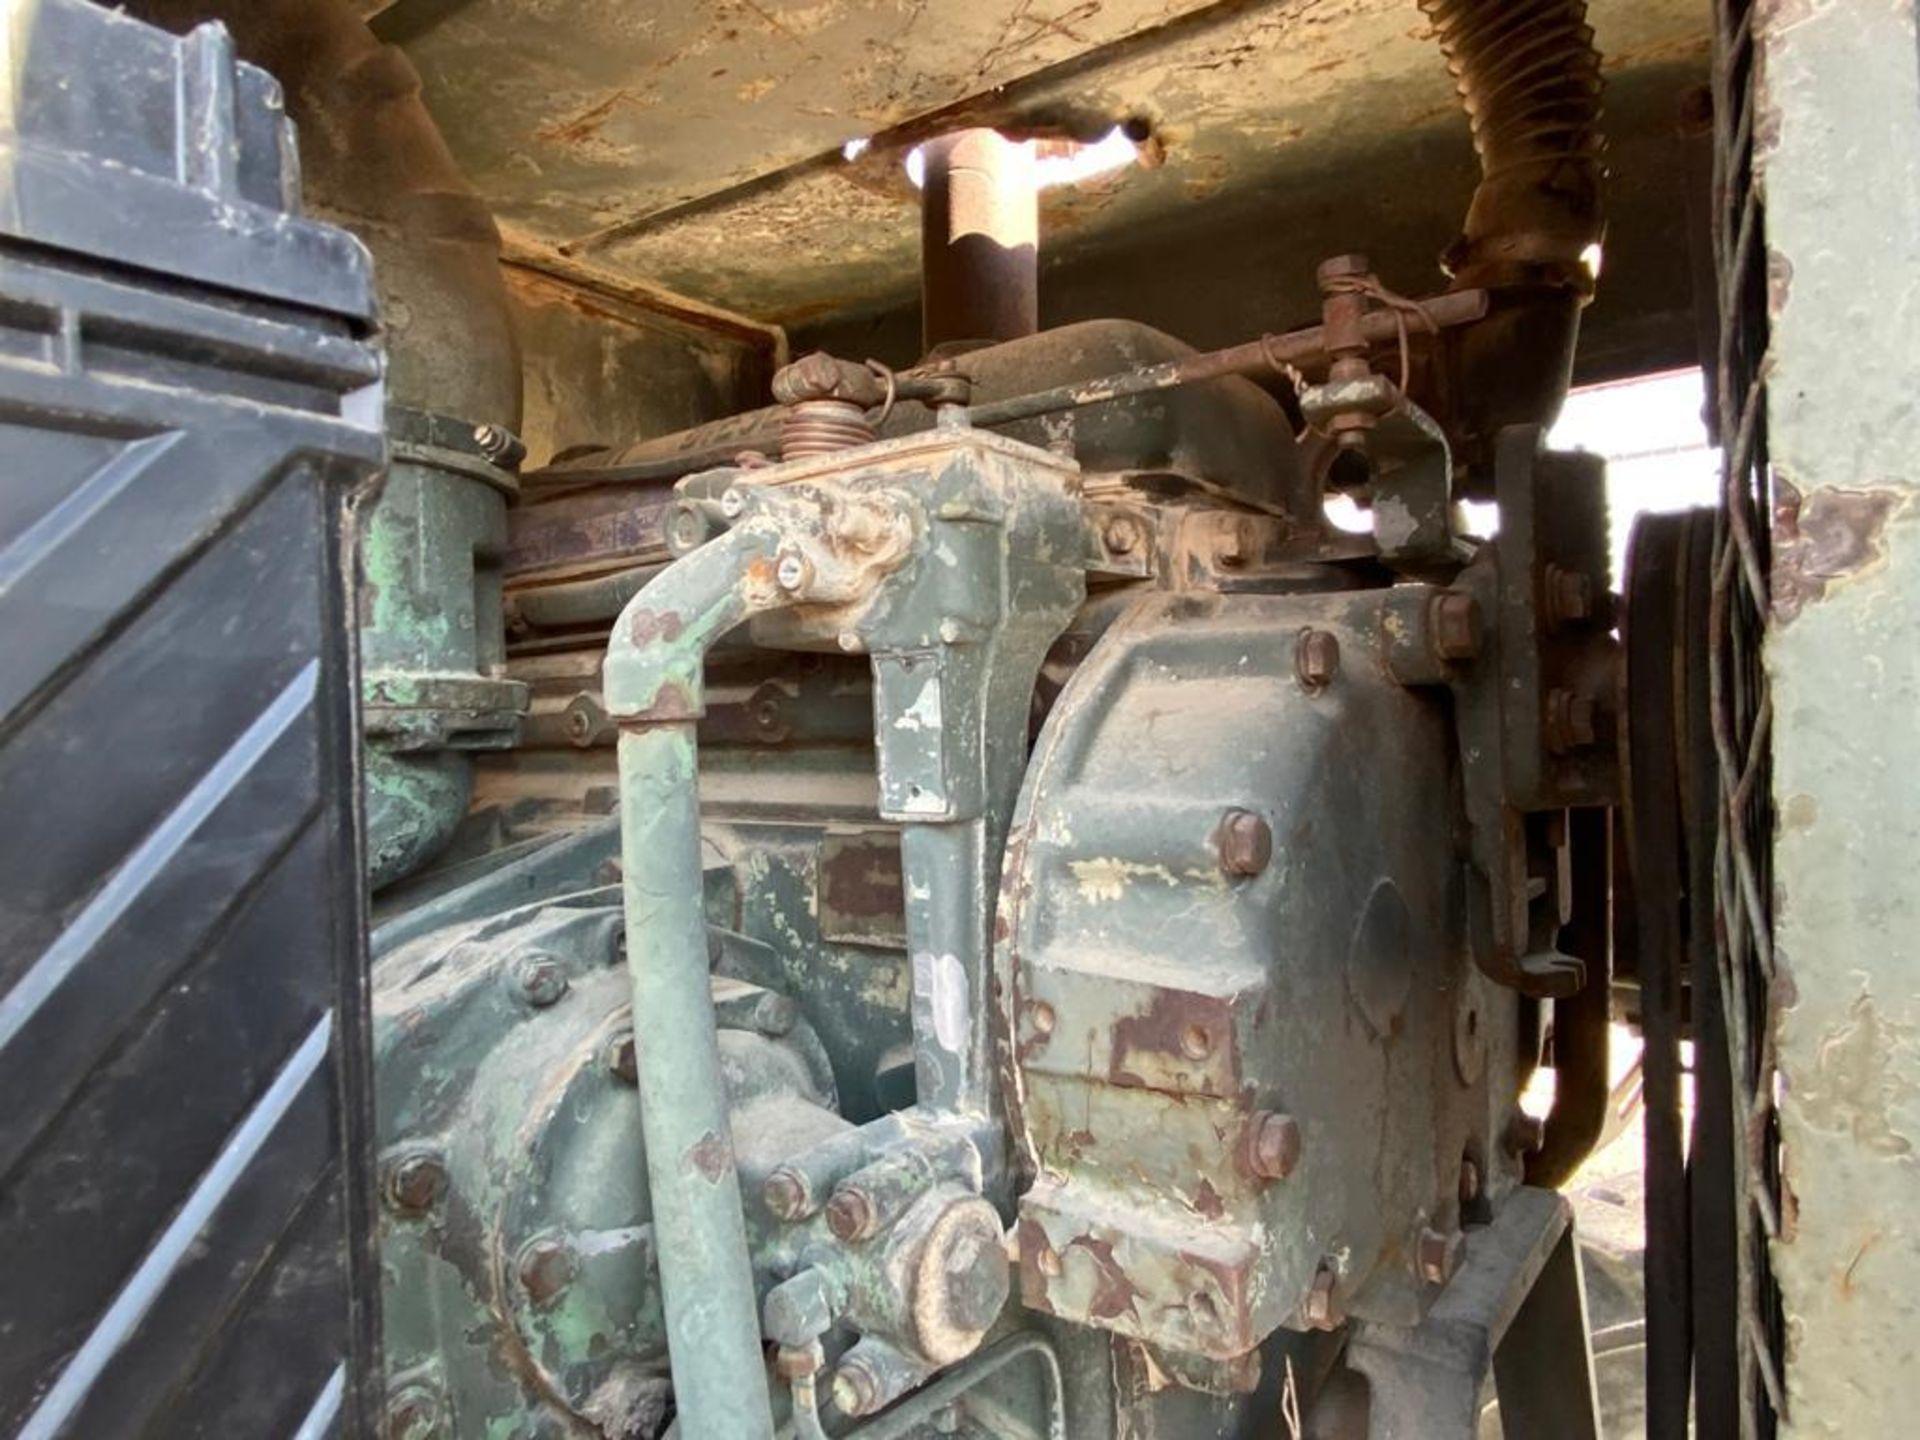 1970 Wabco4 440H Motor Grader, Serial number 440HAGM1398, Motor number 4A156316*RC*4057C - Image 71 of 77